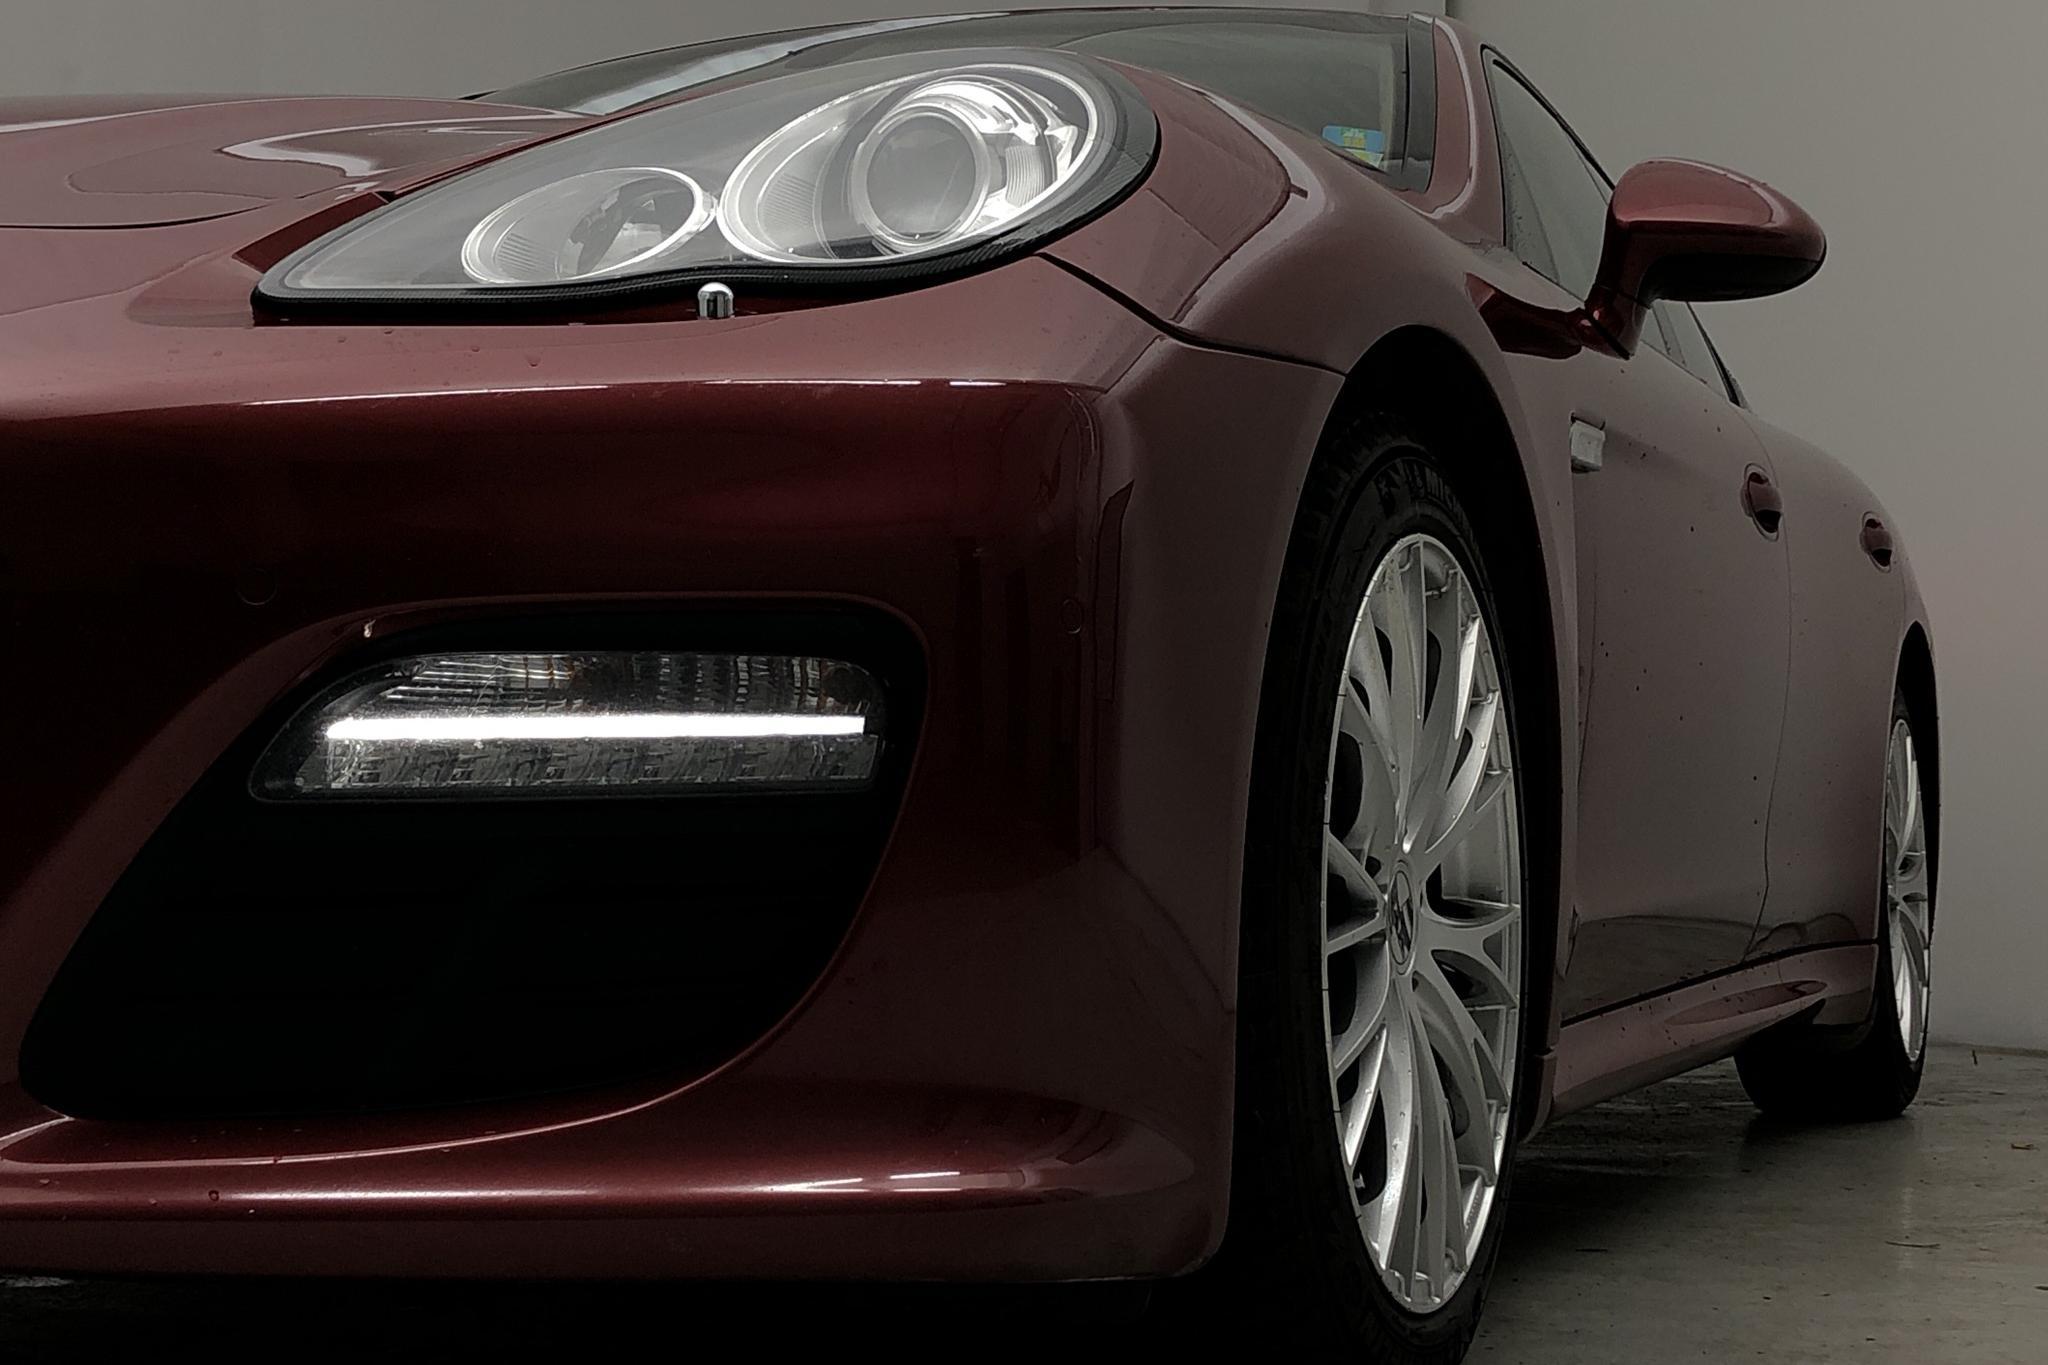 Porsche Panamera 4 (300hk) - 195 790 km - Automatic - Dark Red - 2012